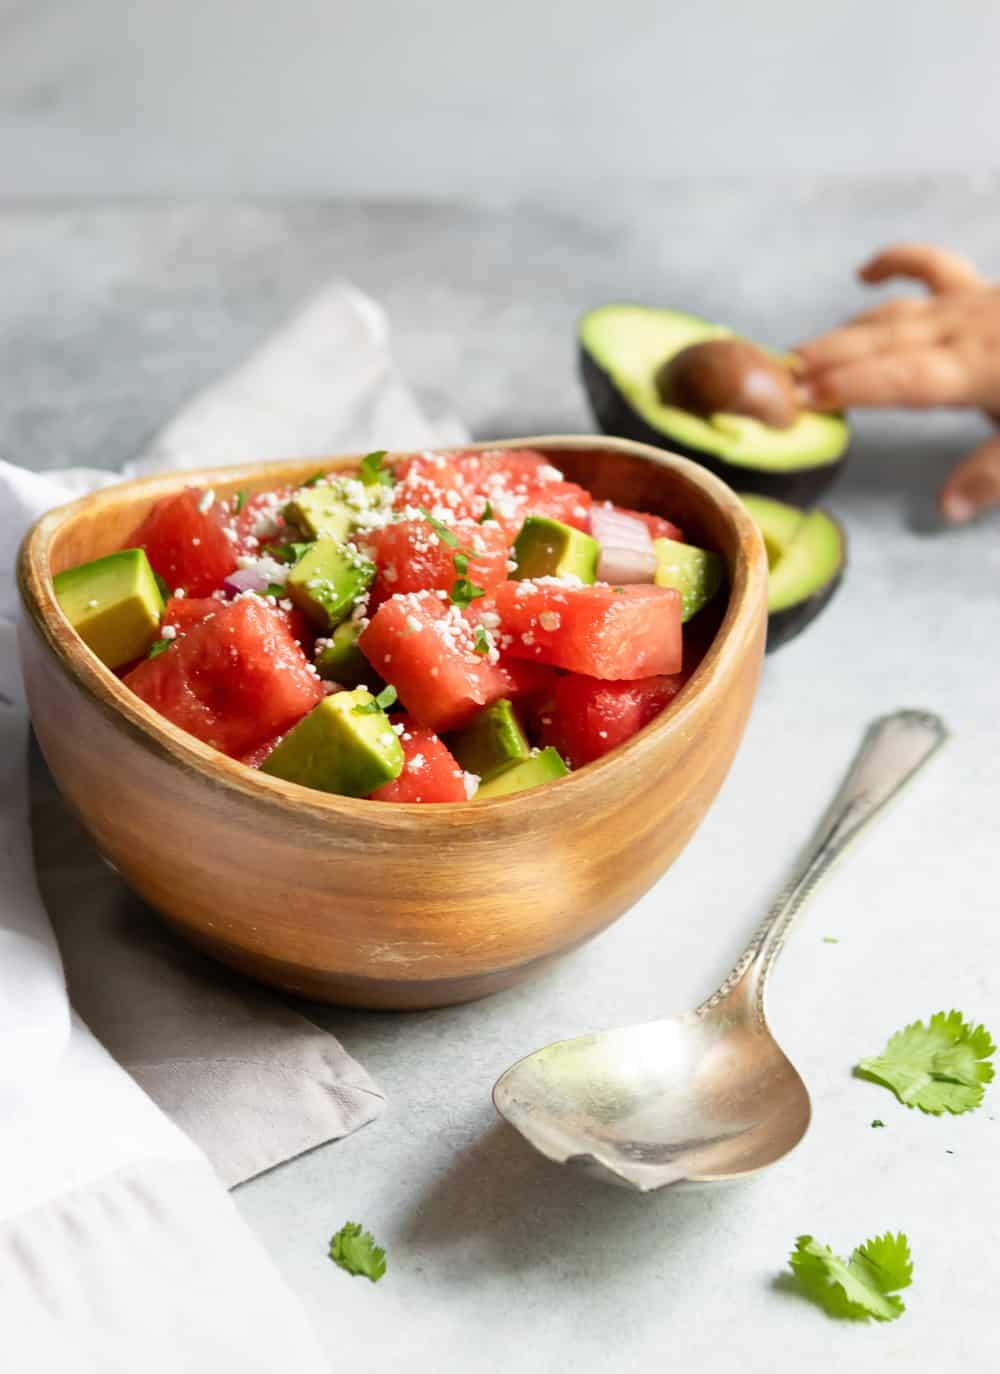 Watermelon Avocado Salad with Feta.